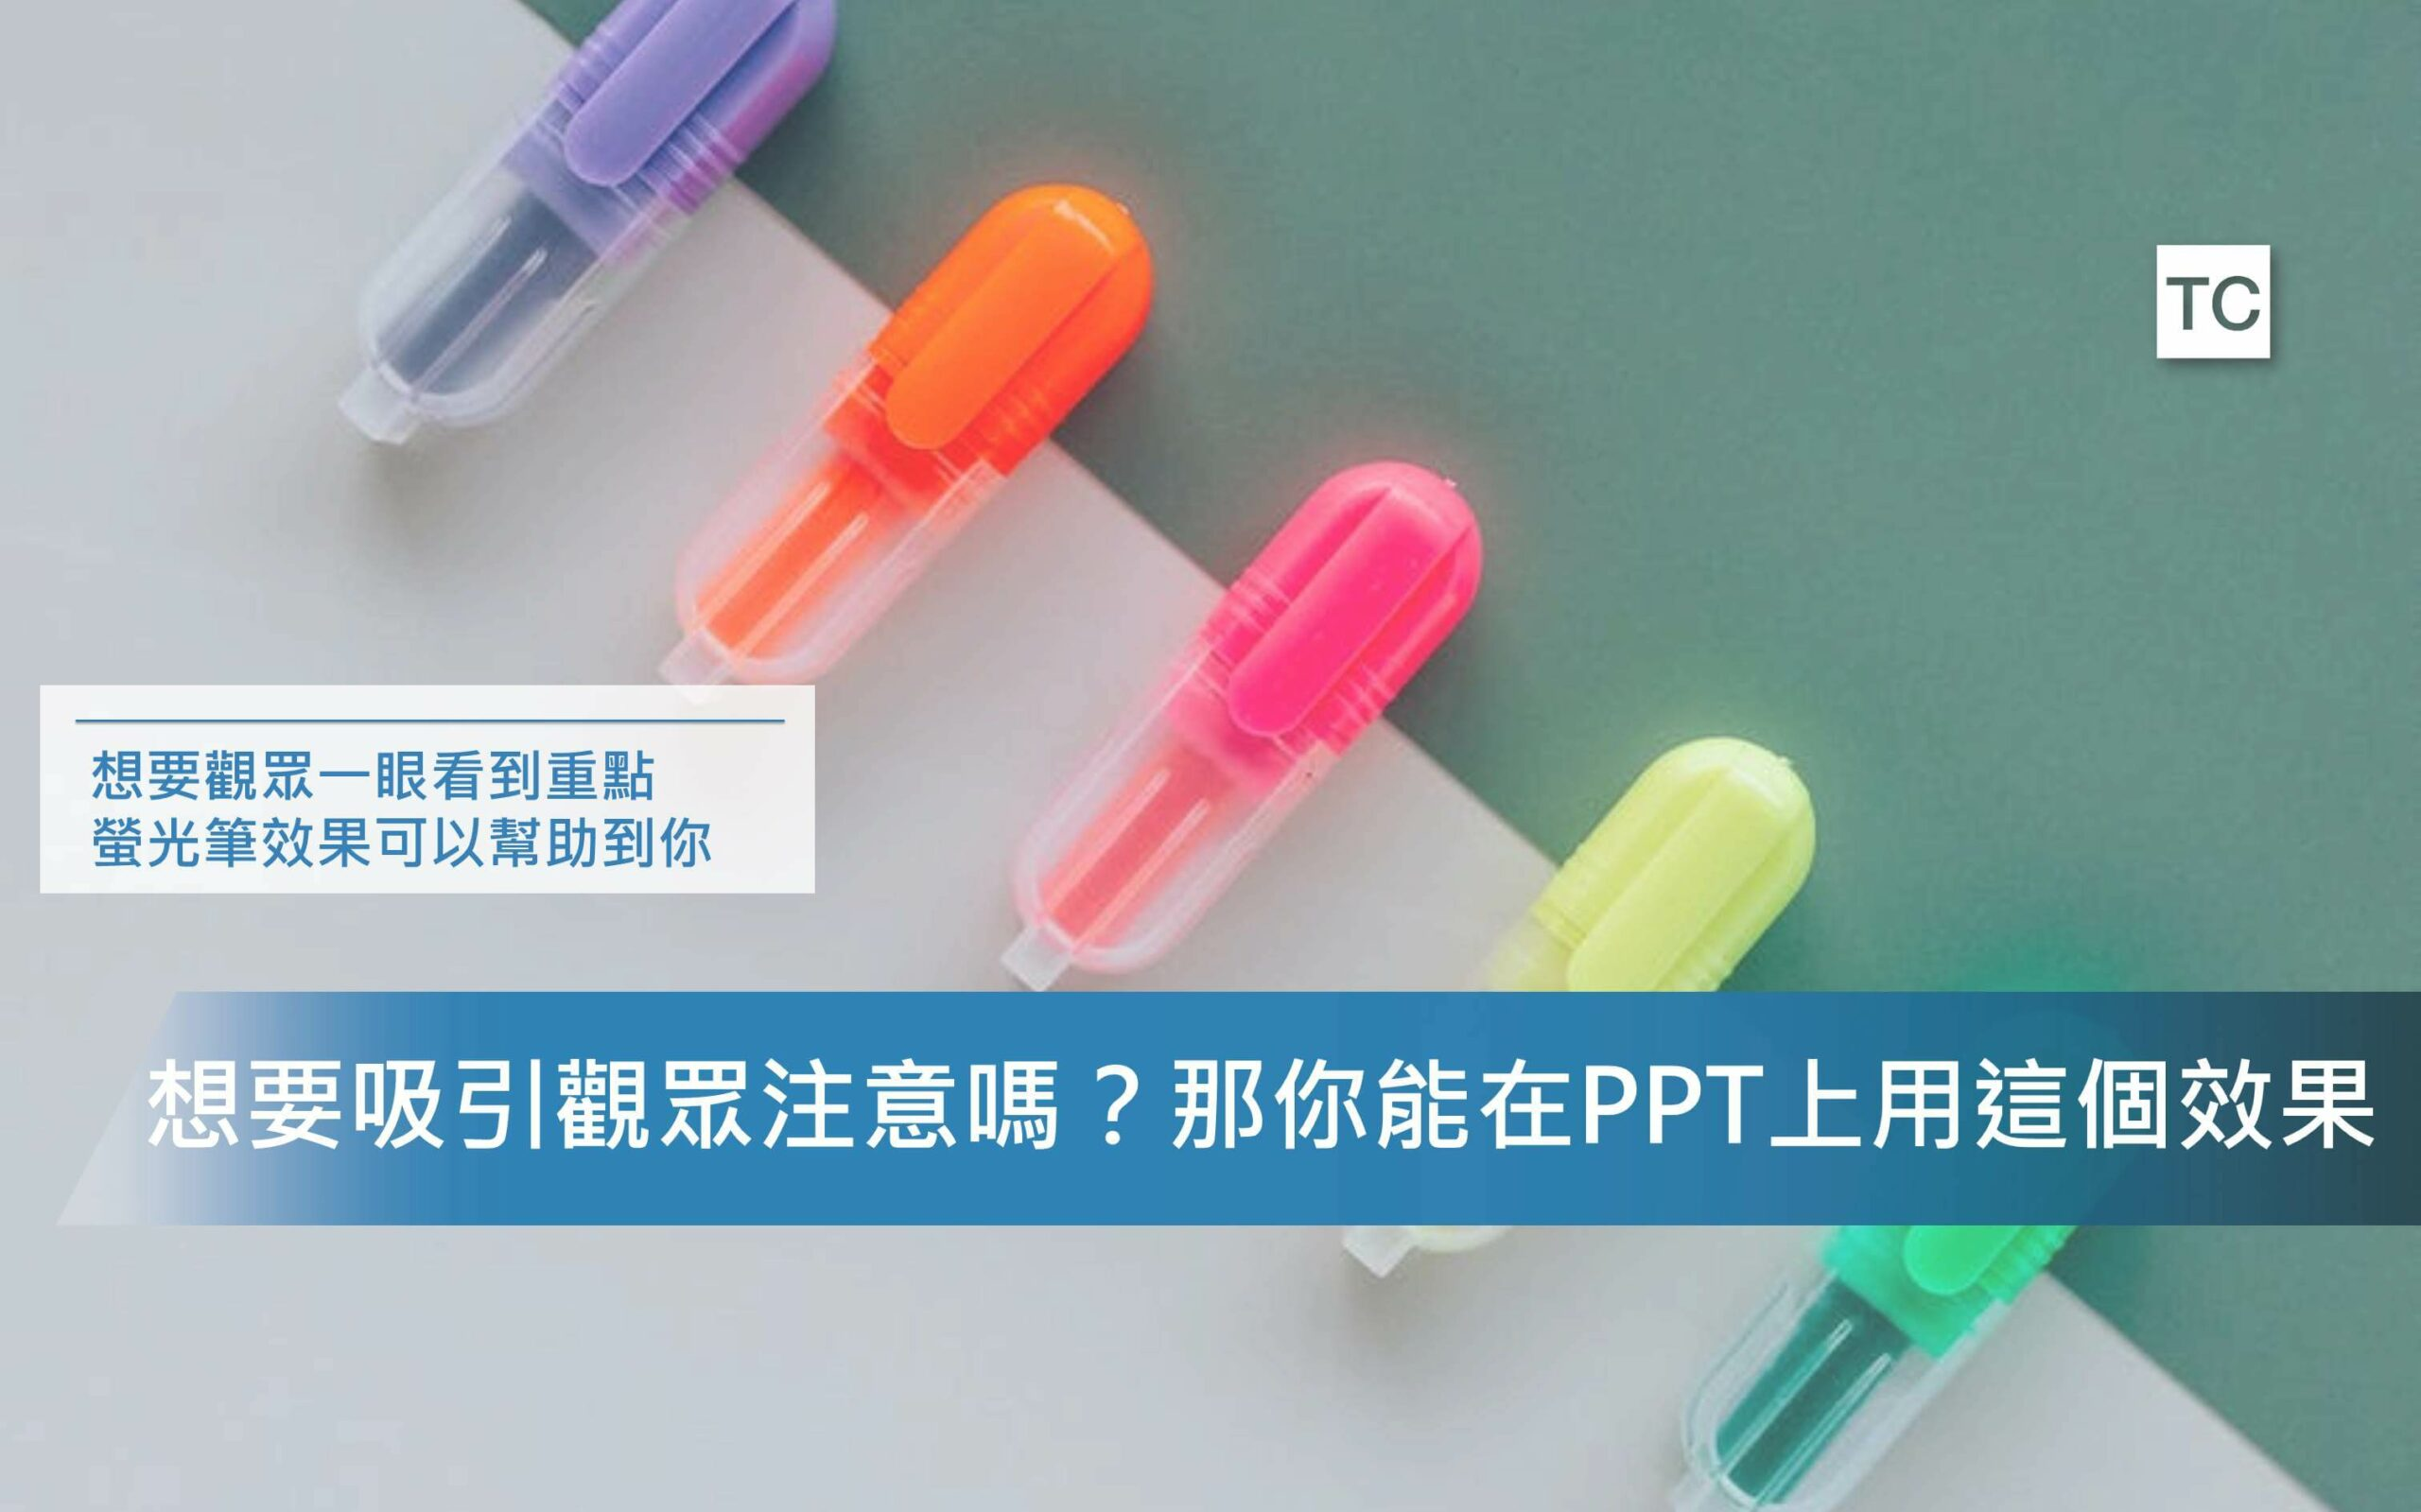 PPT教學|製作PPT螢光筆效果,讓觀眾馬上看到你的重點!